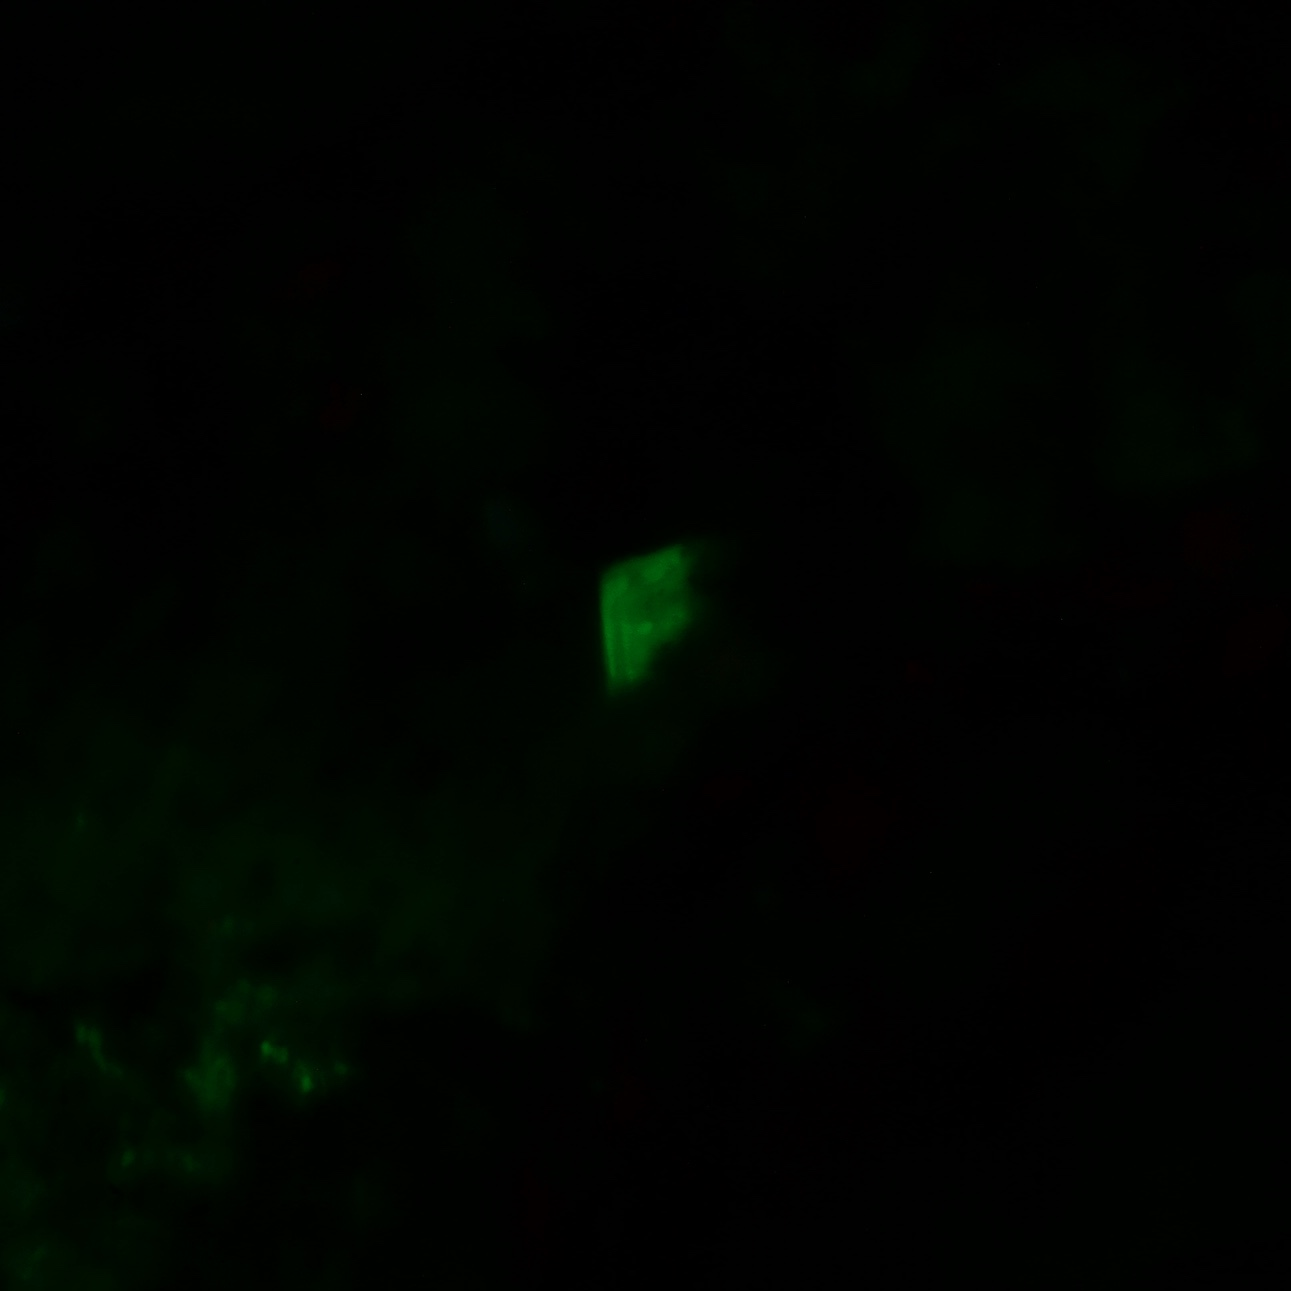 Colección de Minerales Fluorescentes - Página 5 Fullsi66